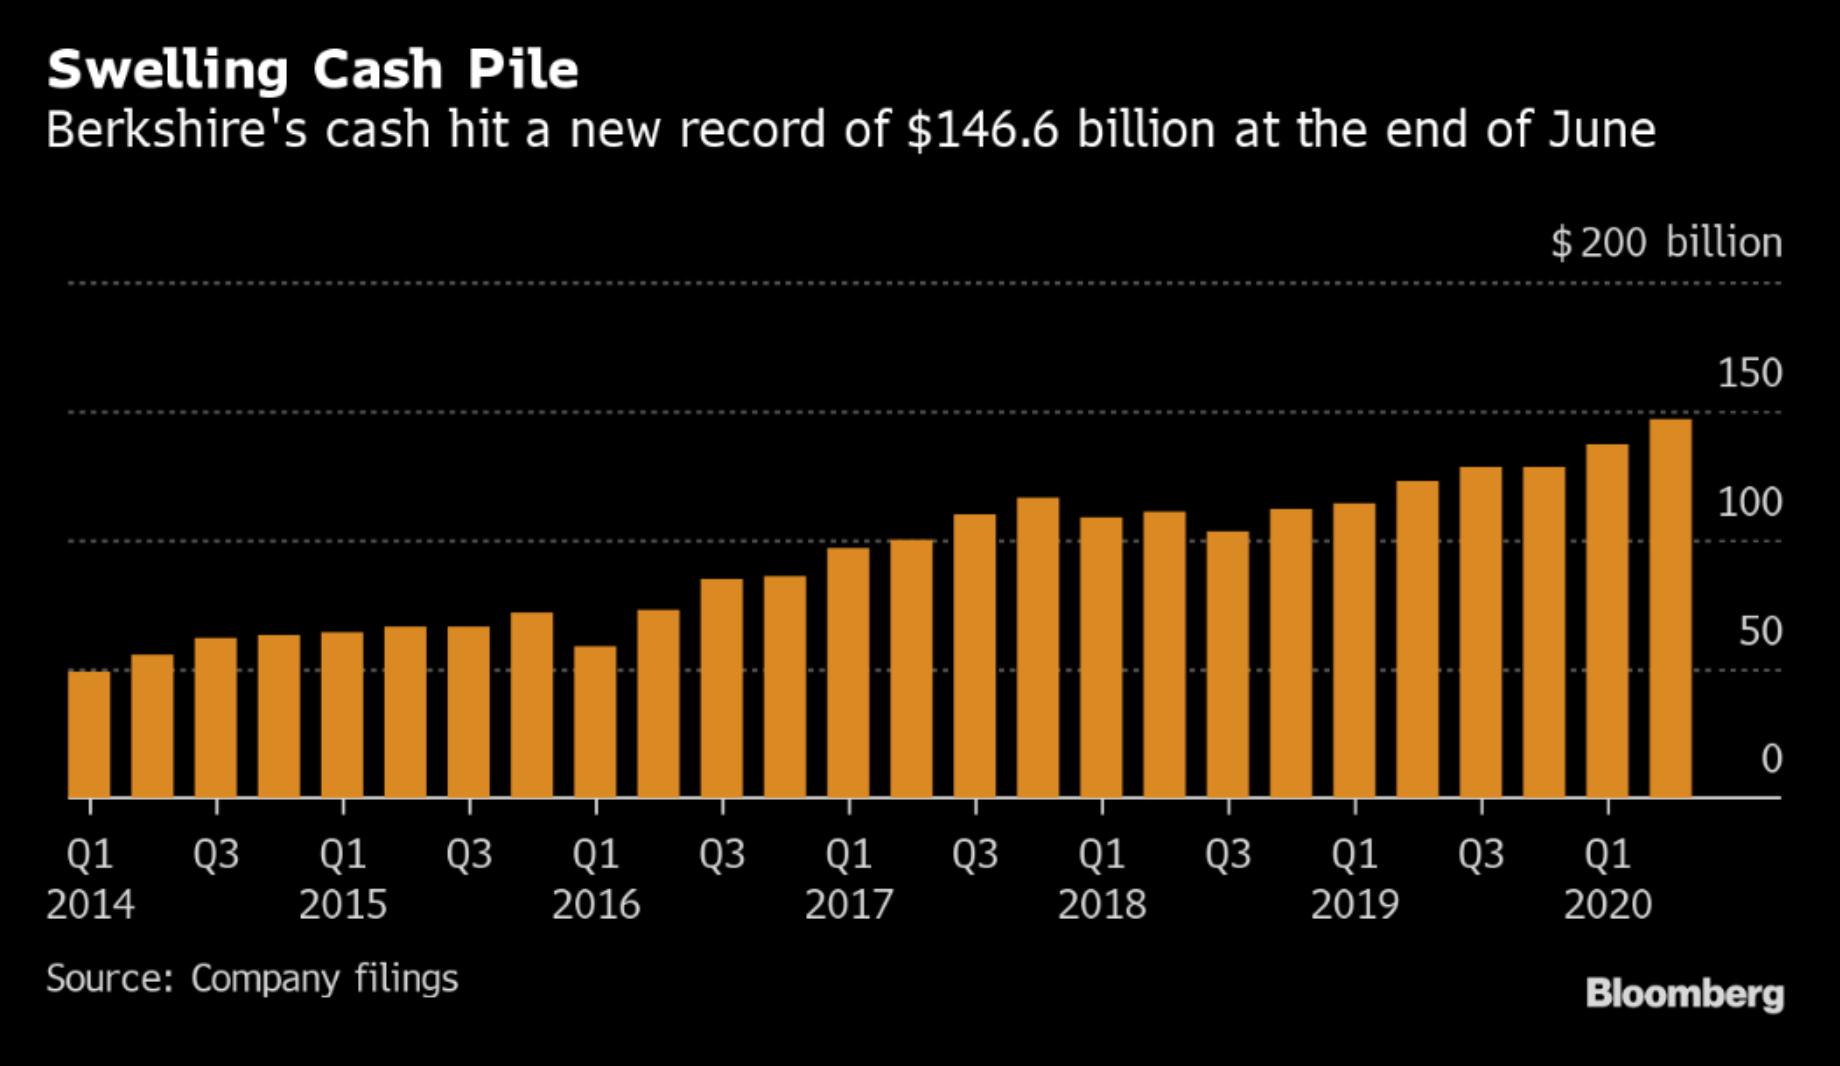 Vývoj hotovosti Berkshire Hathaway, zdroj: Bloomberg